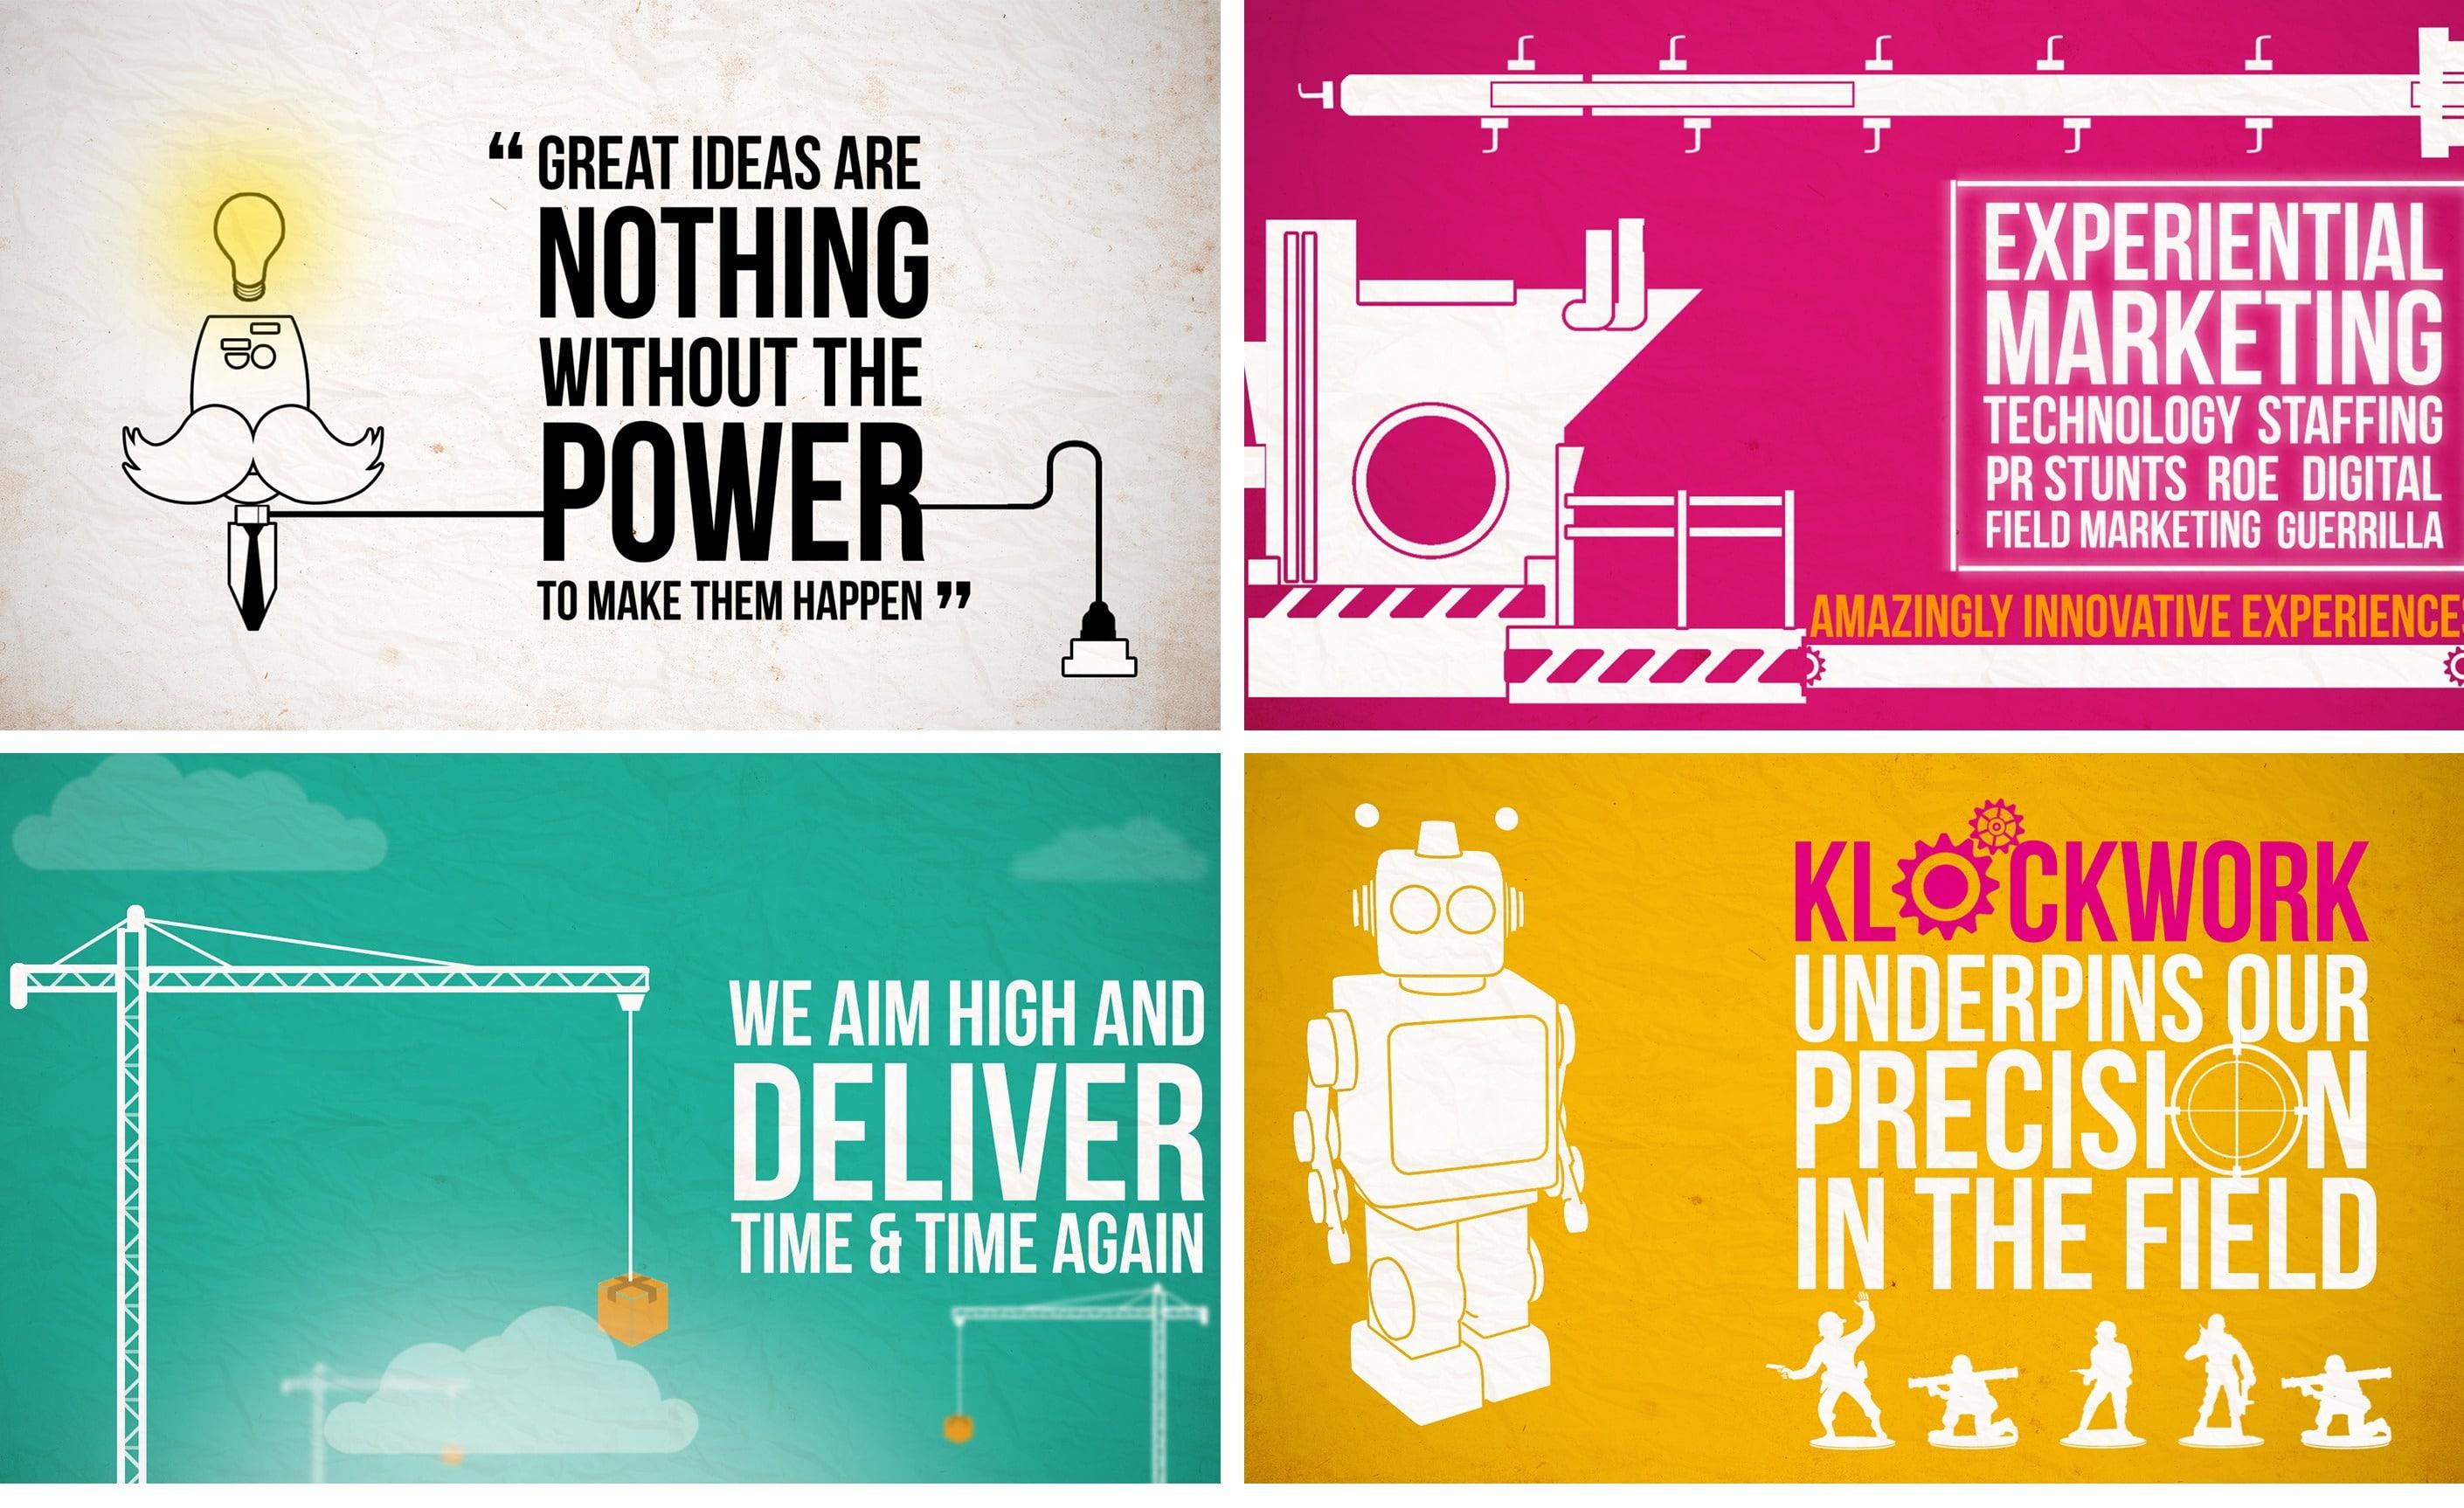 stas3dart-kommando-experiential-marketing-info-motion-graphic-video-web-animation-2